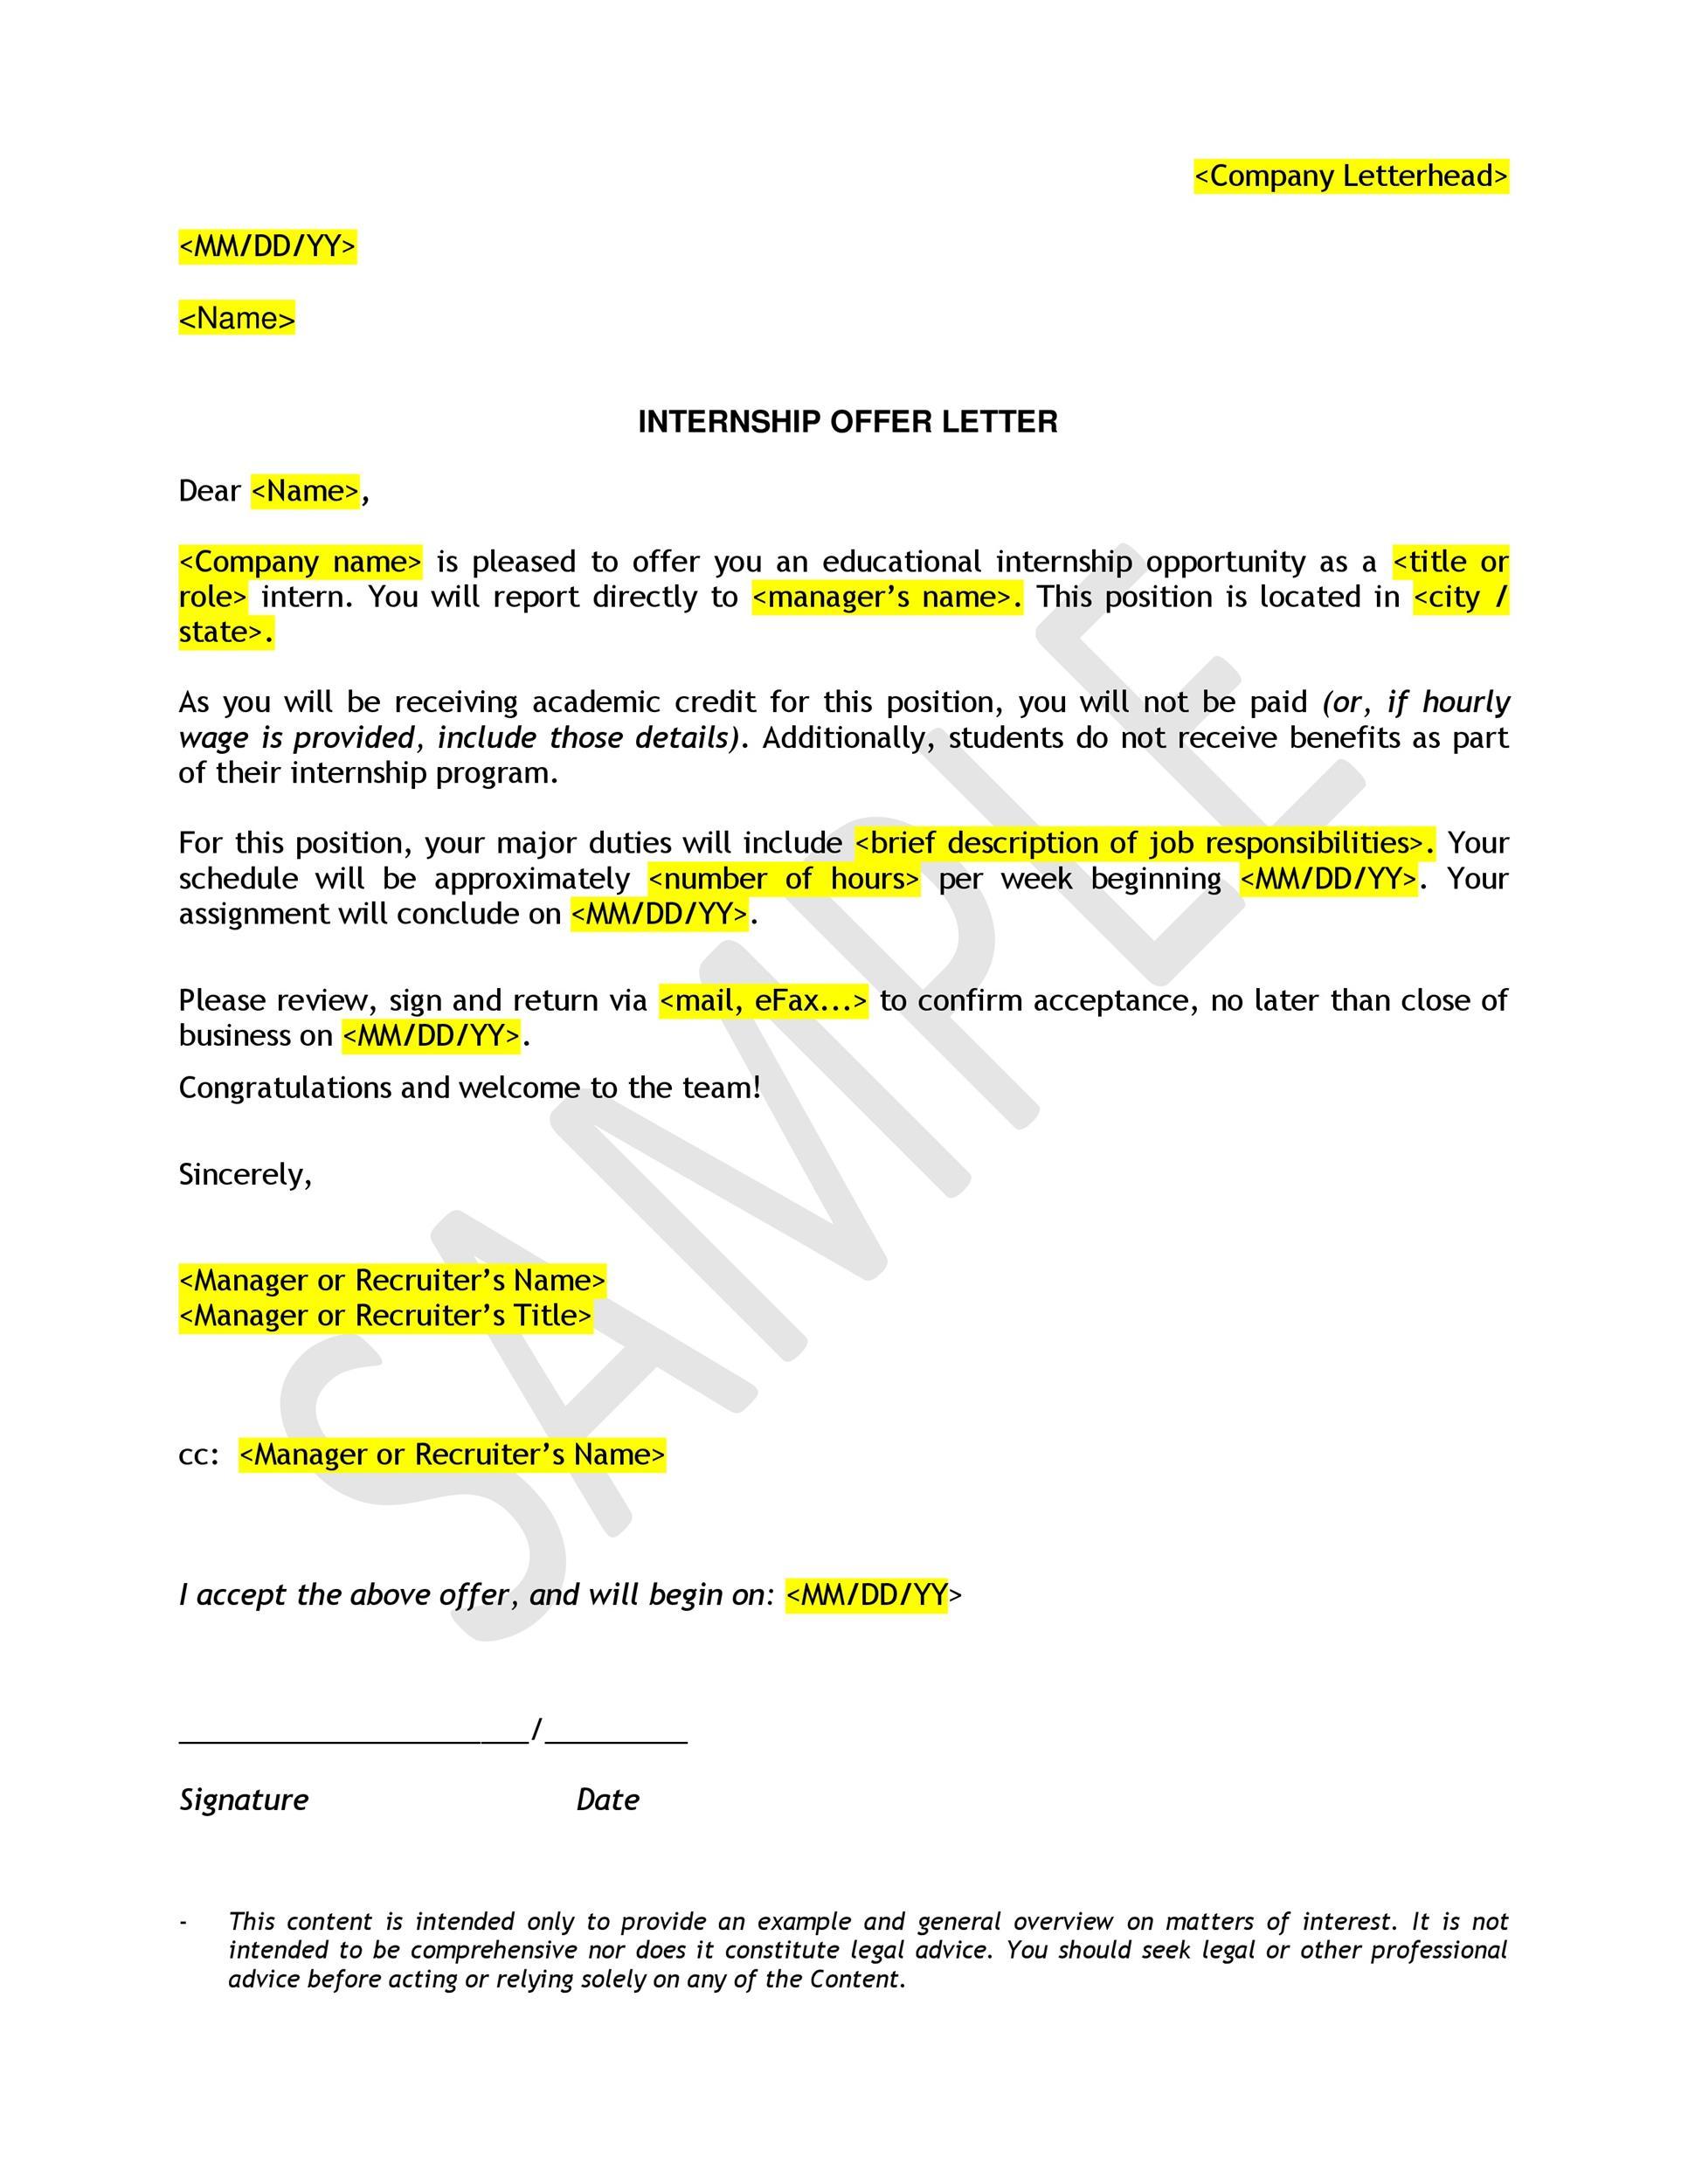 Free Offer letter 33